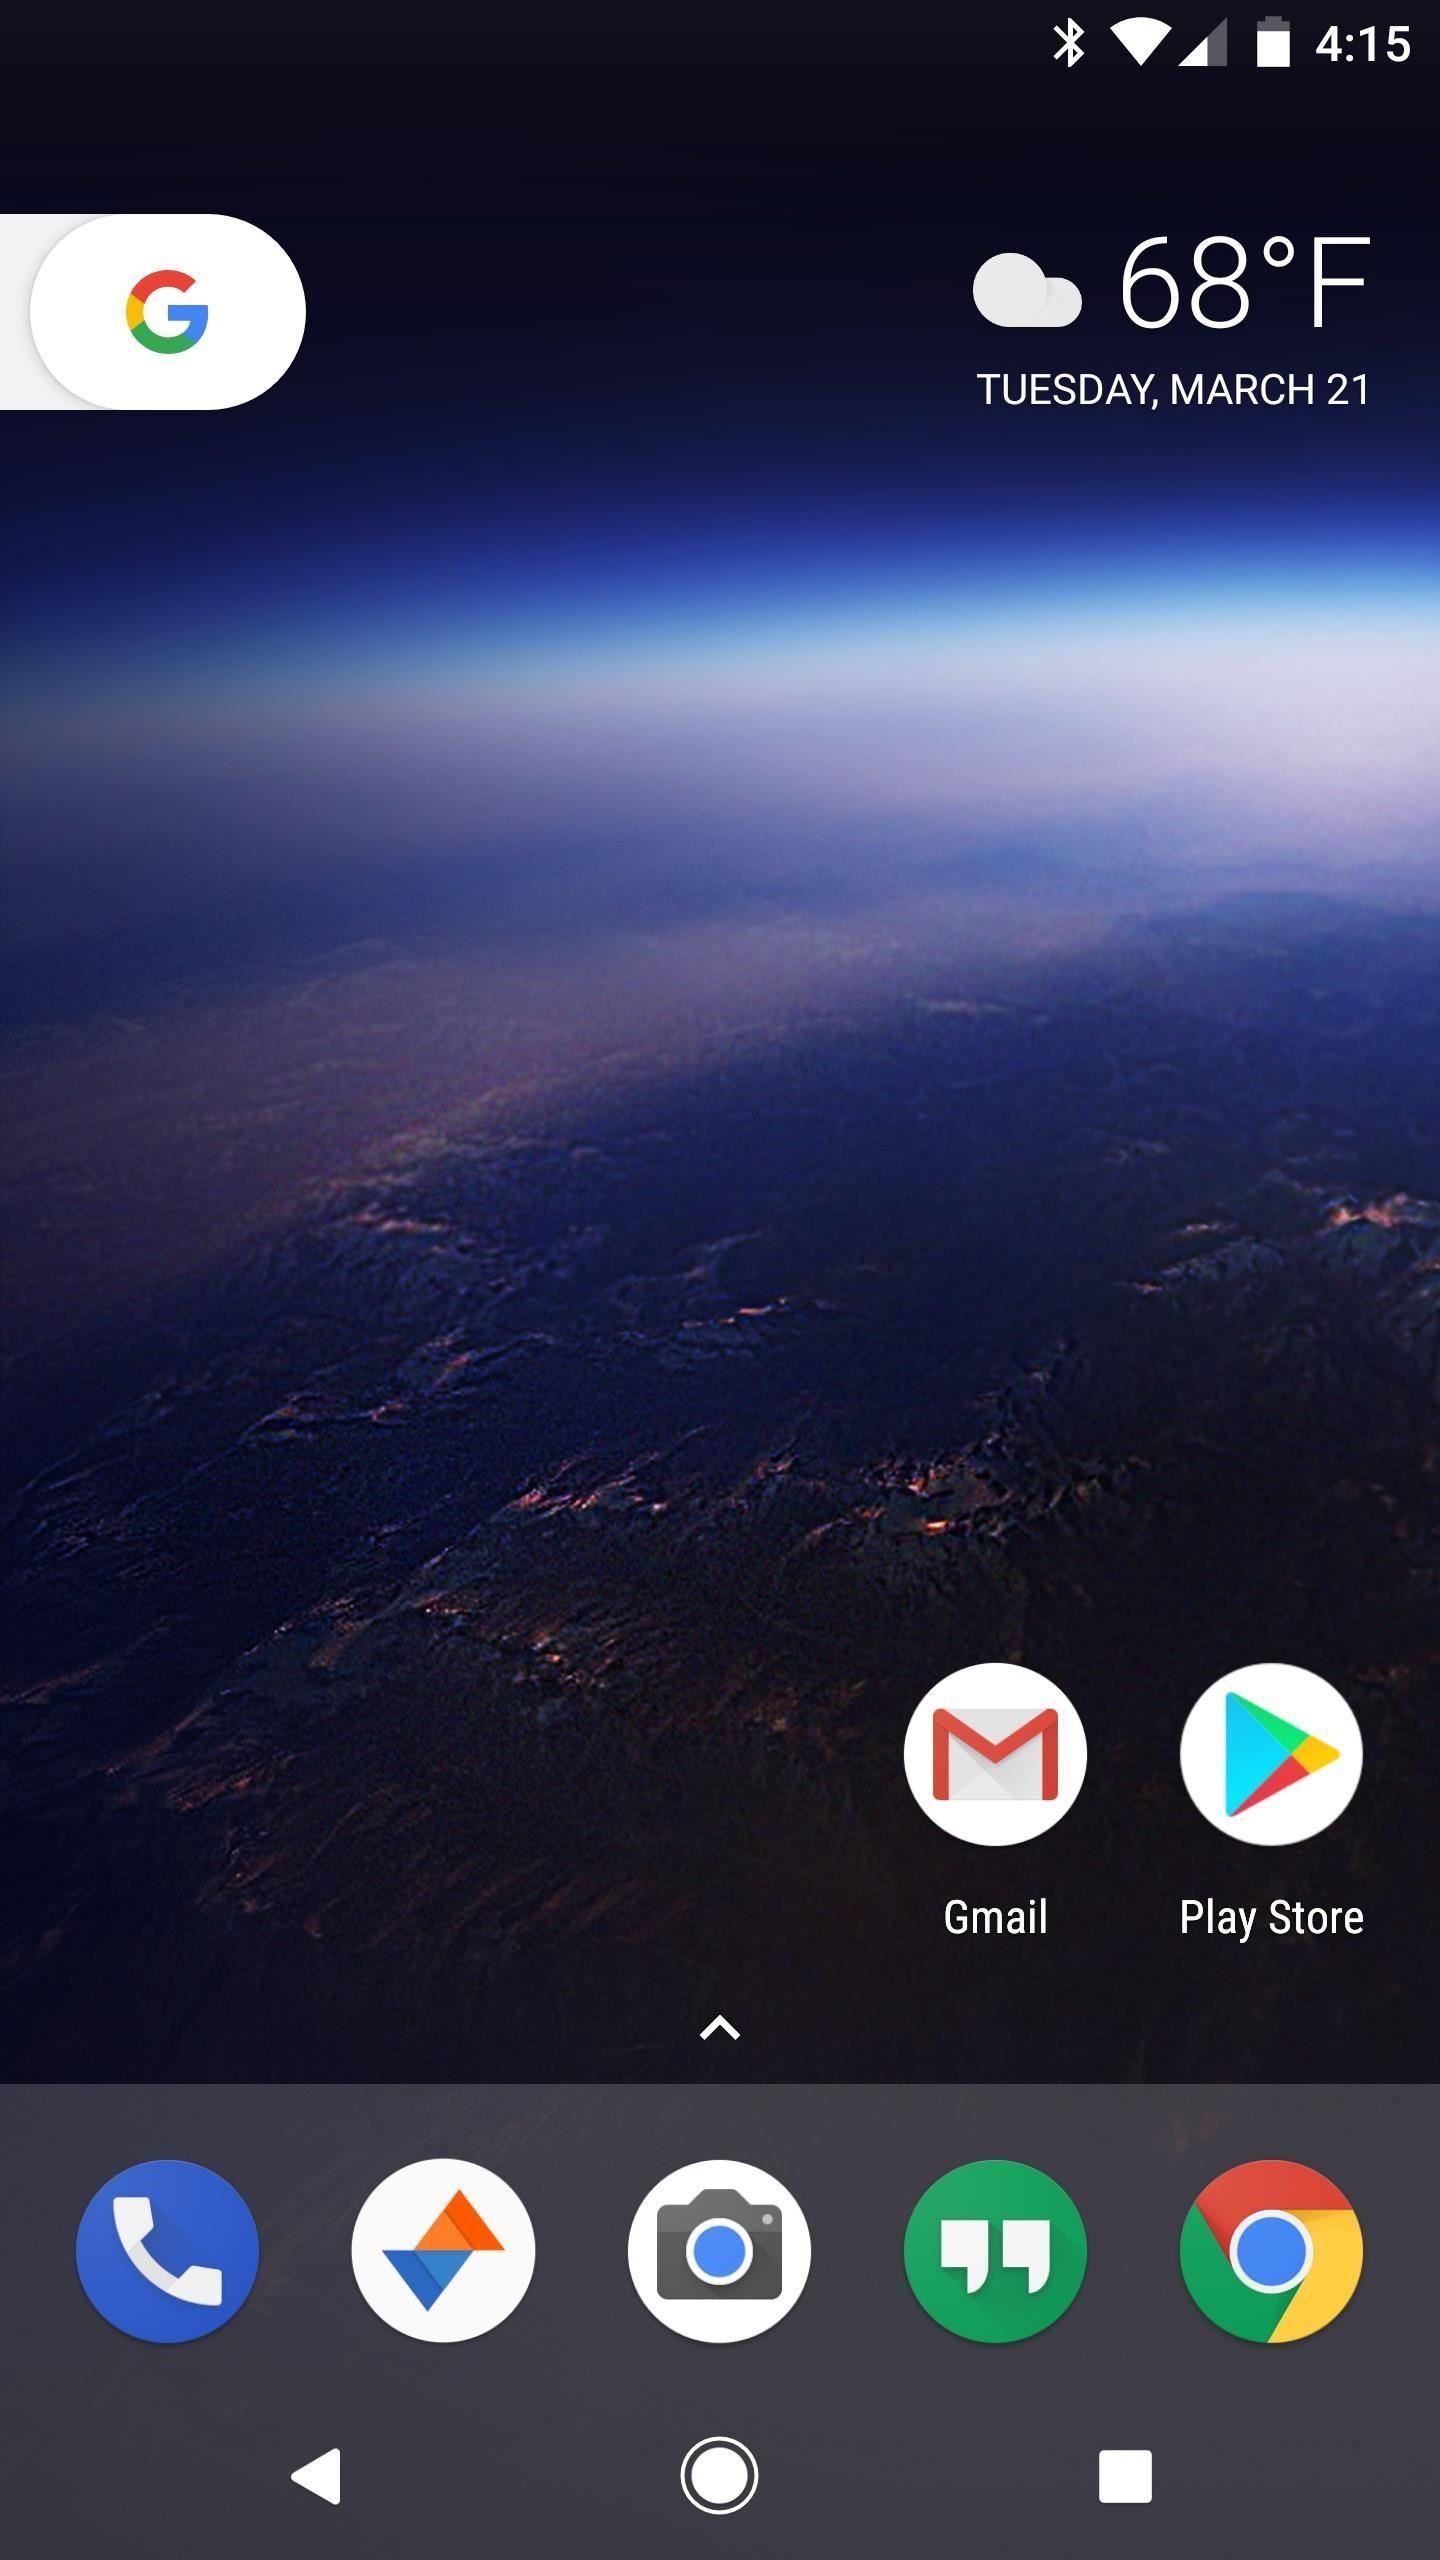 Gmail theme engine - 16pixel Launcher App Drawer Improvements